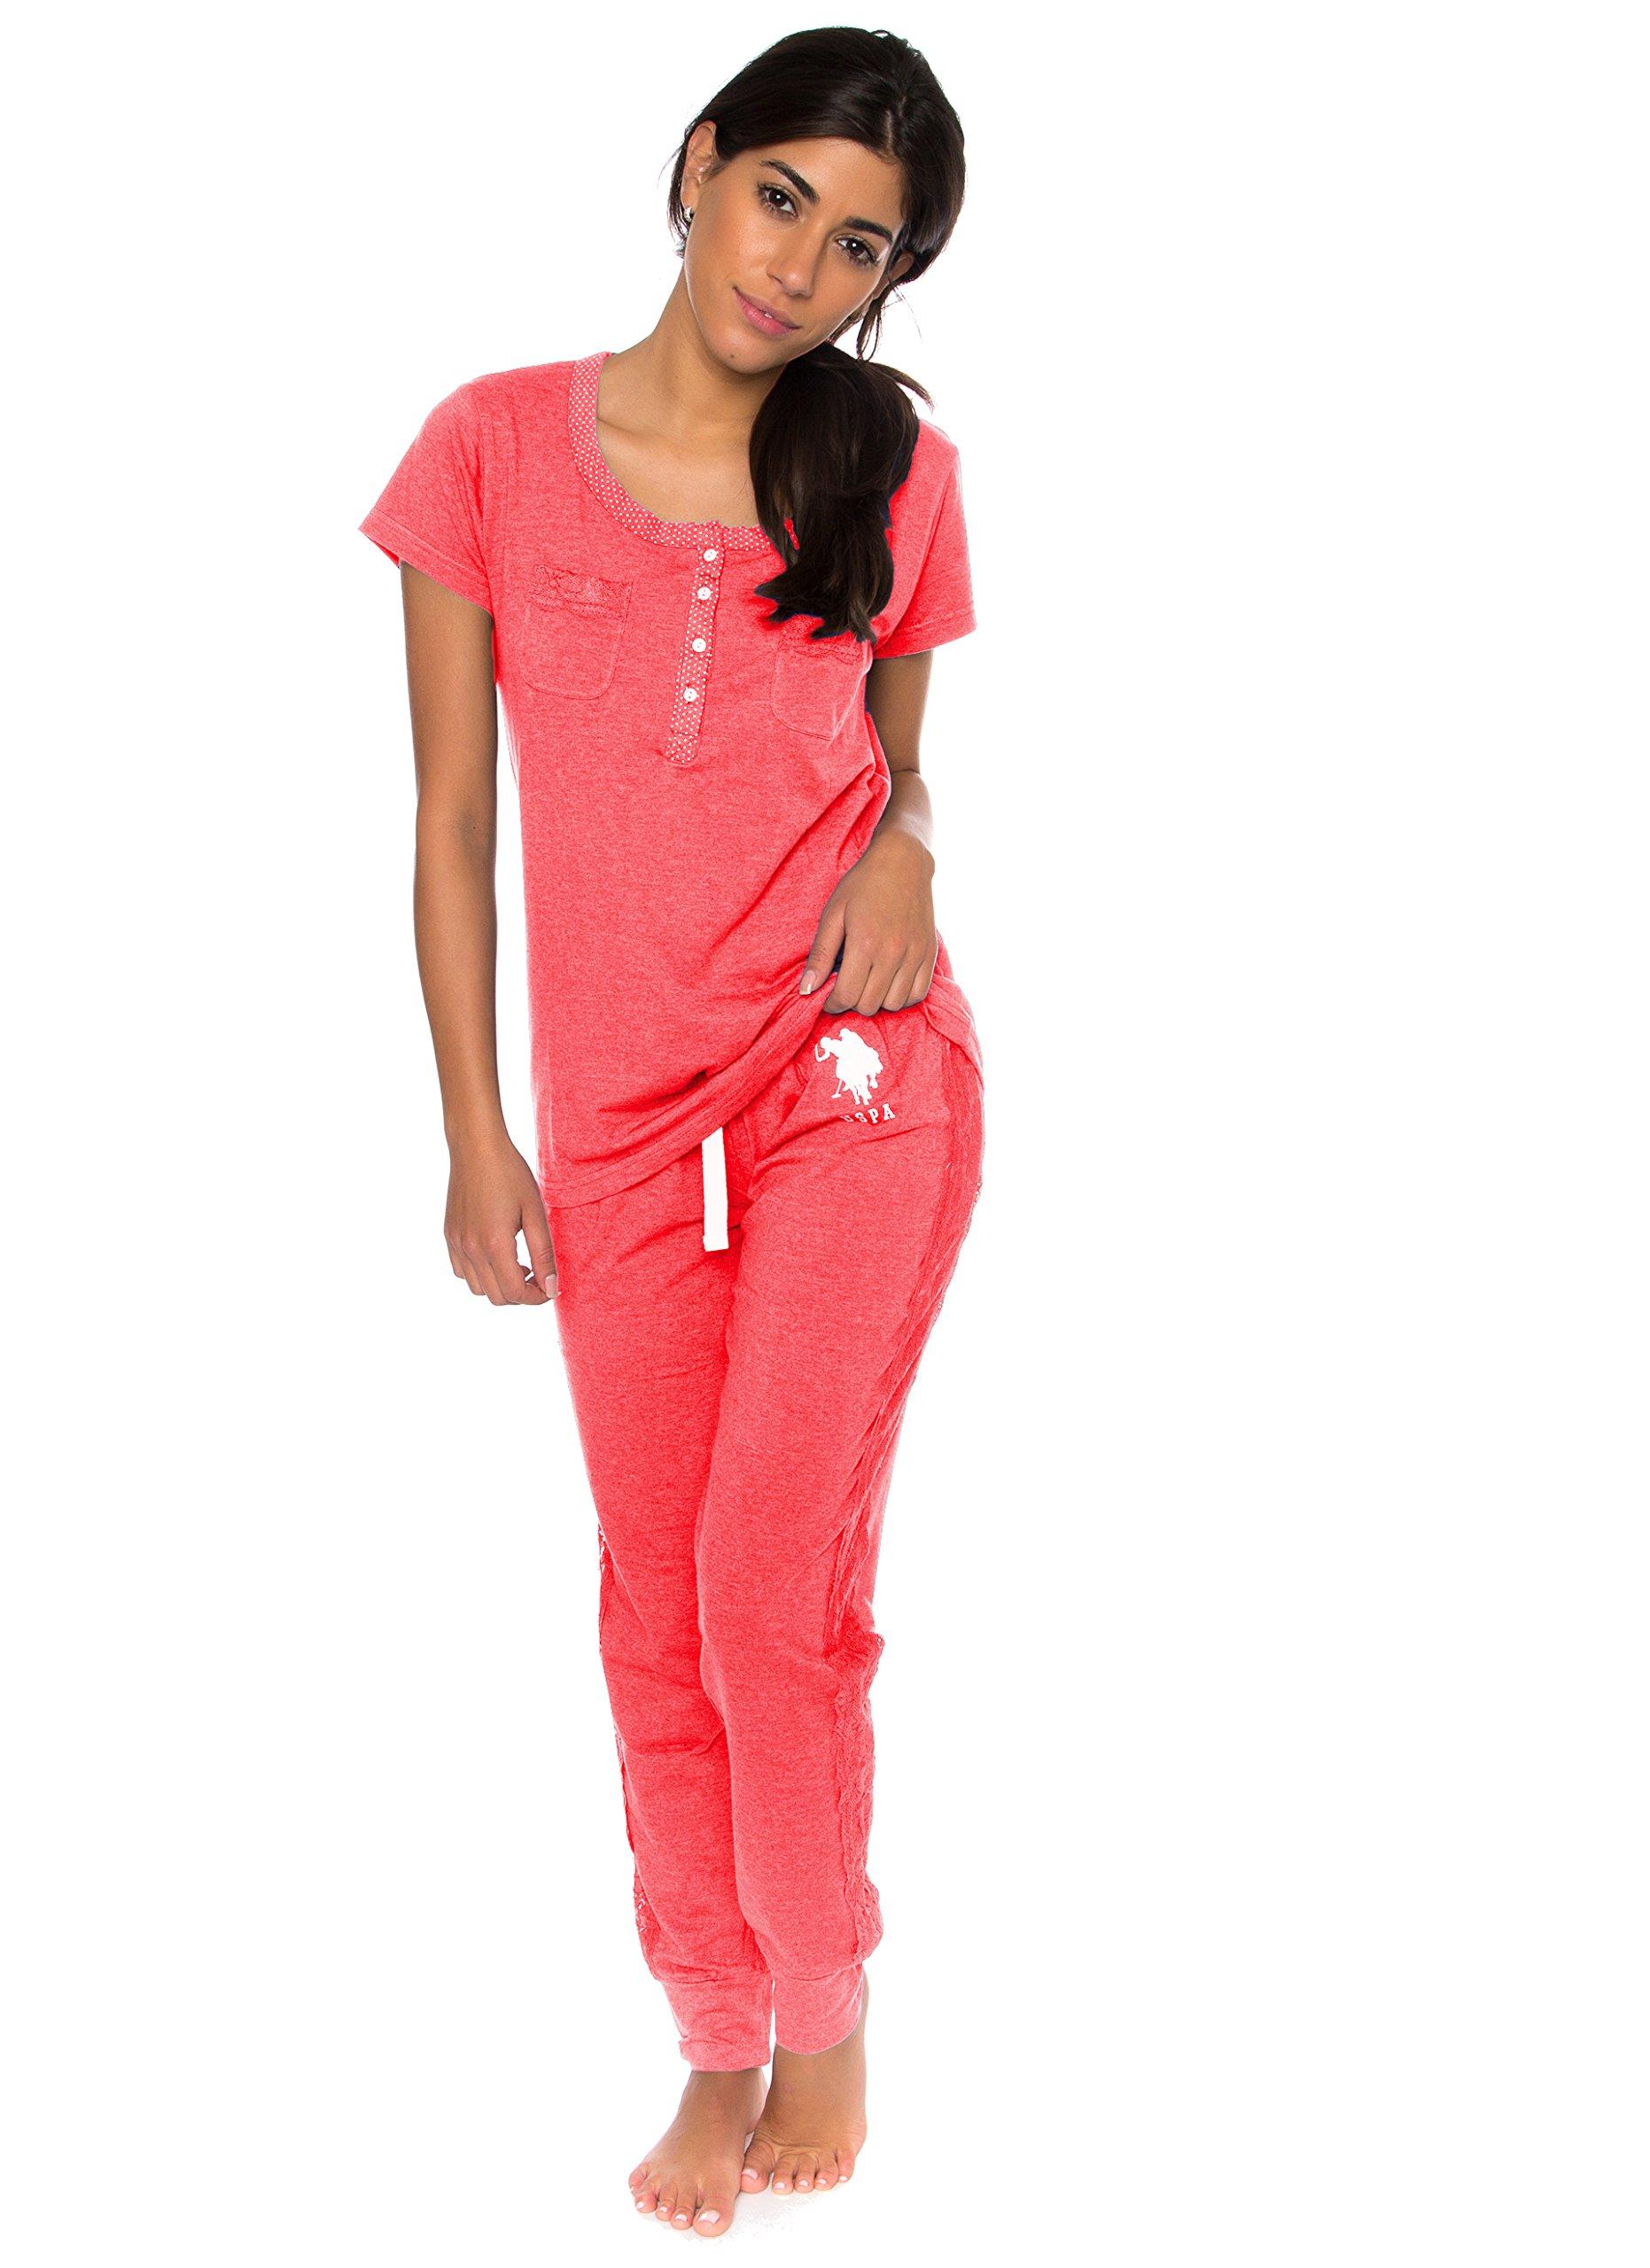 leggings shopmadewell most enlarge pajama comfortable striped pajamas pdp madewell comforter p